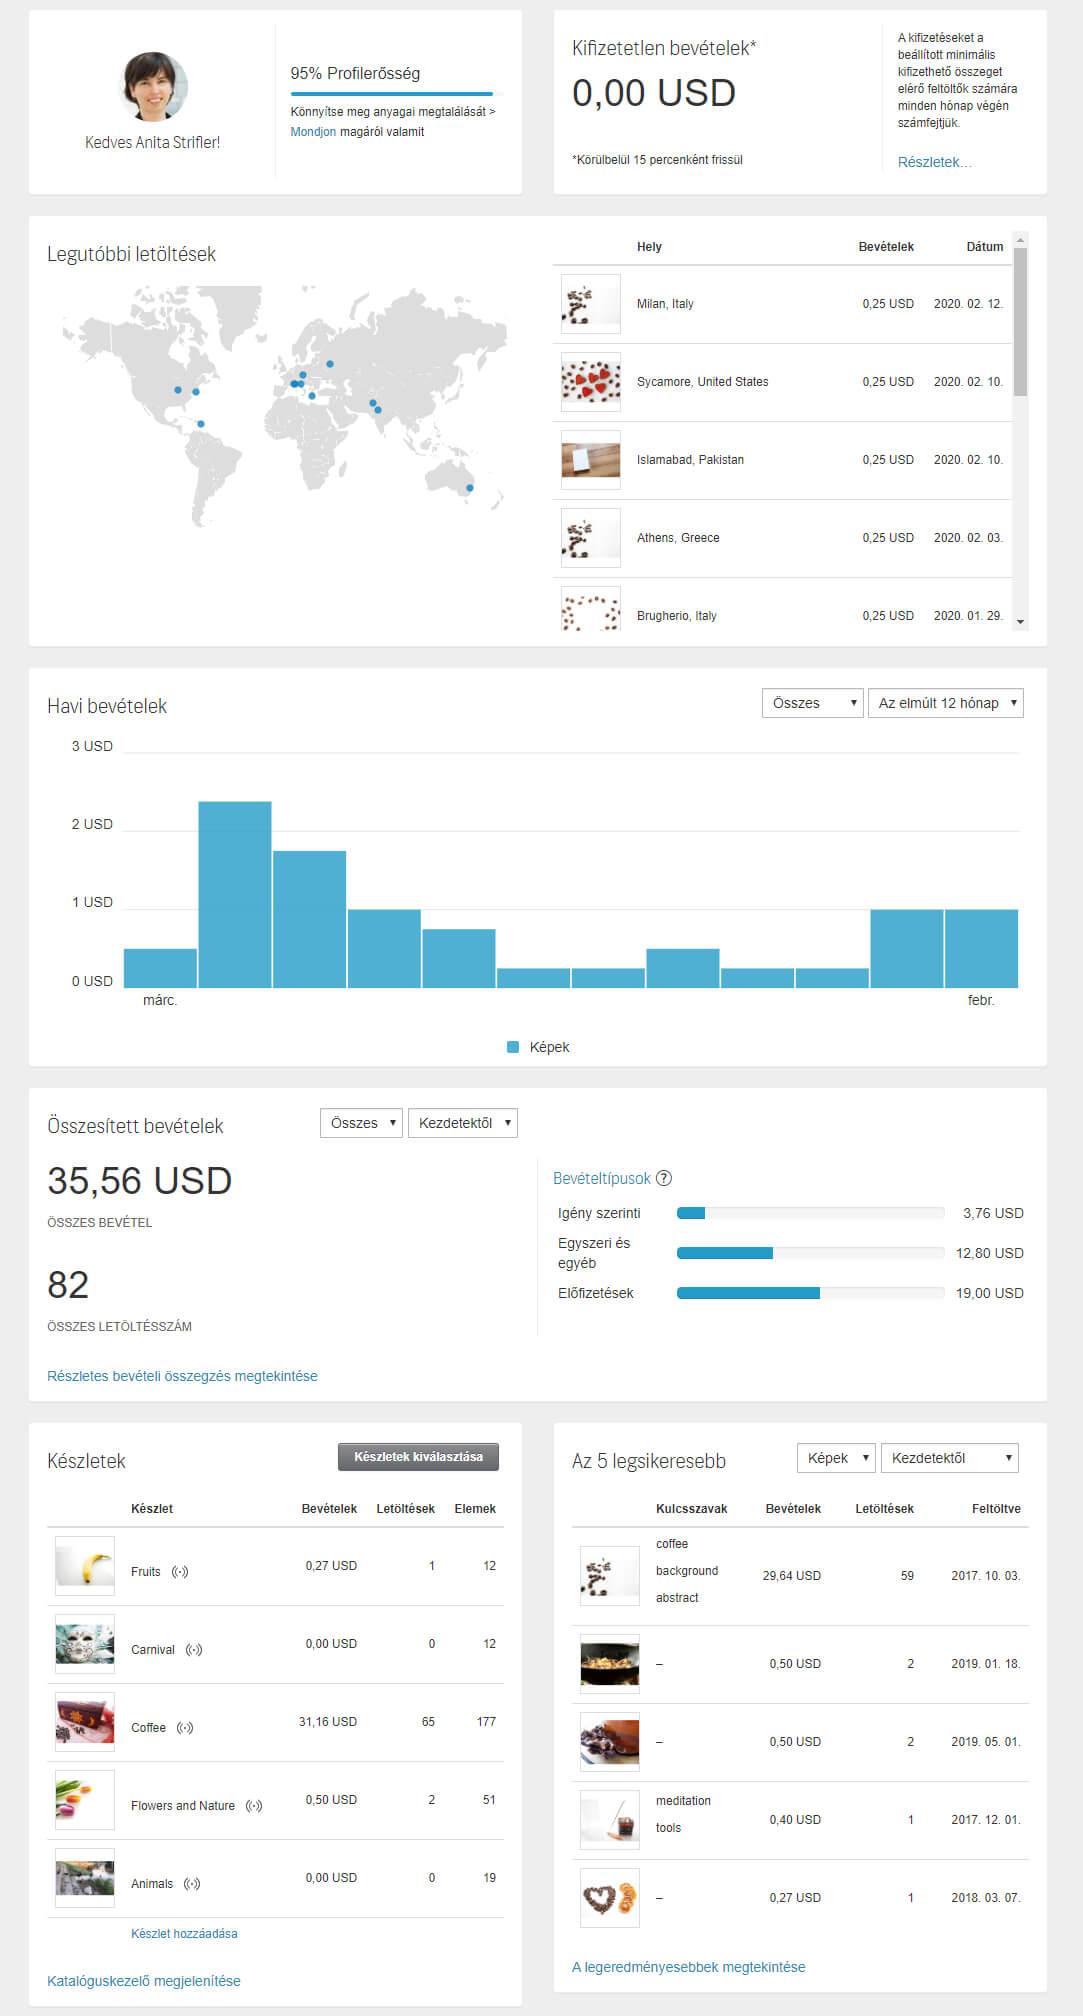 Shutterstock fiók, kifizetés